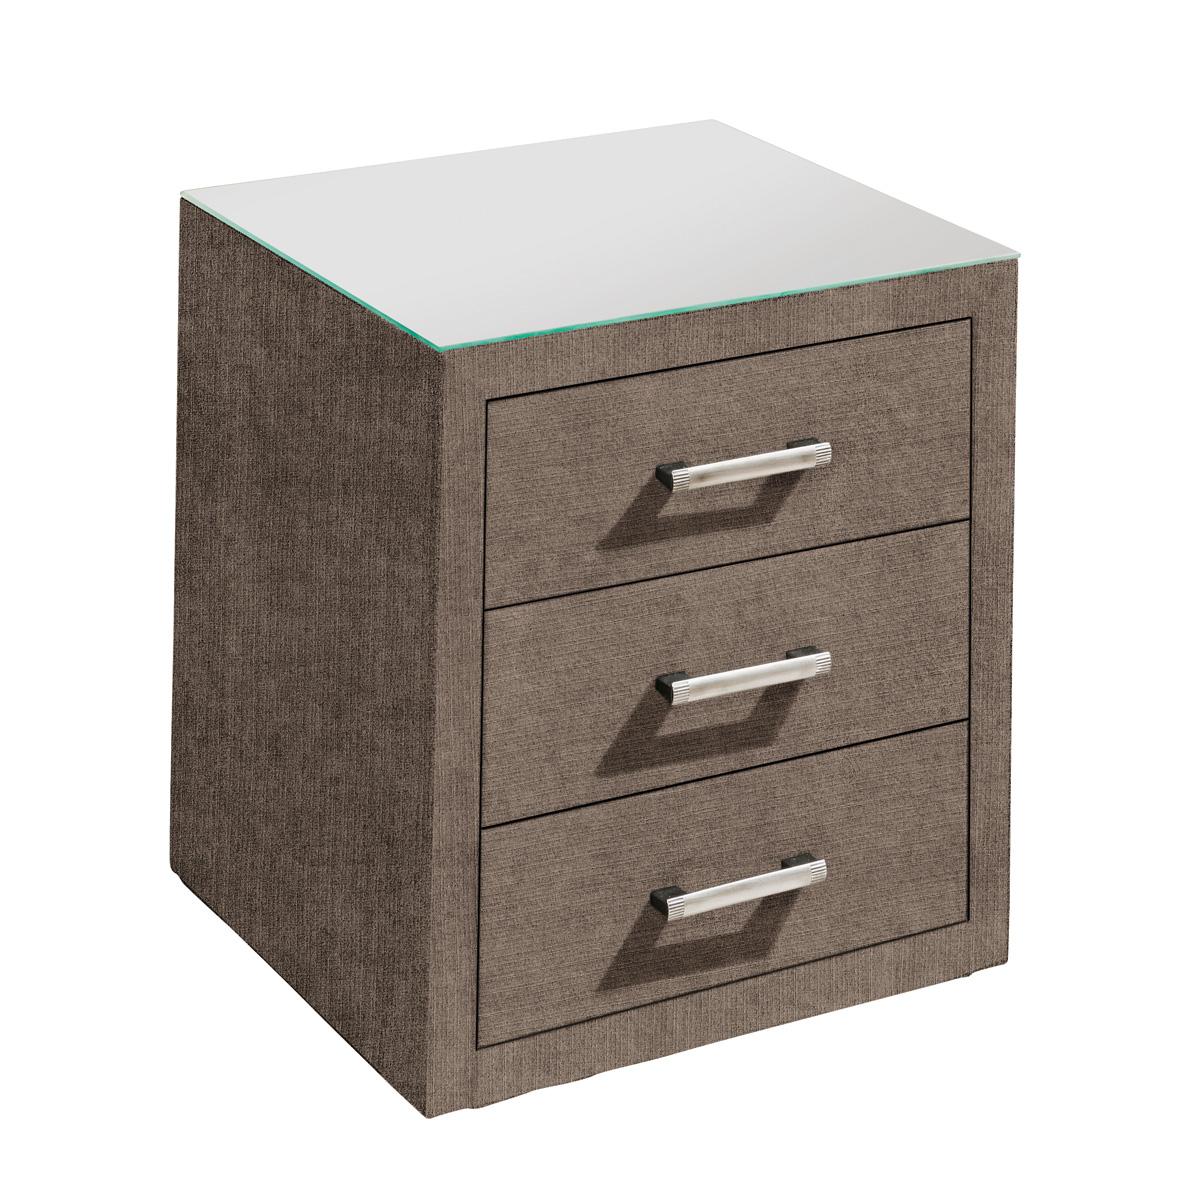 nachtkommode heaven nachtkonosole kommode nako konsole in grau anthrazit braun ebay. Black Bedroom Furniture Sets. Home Design Ideas